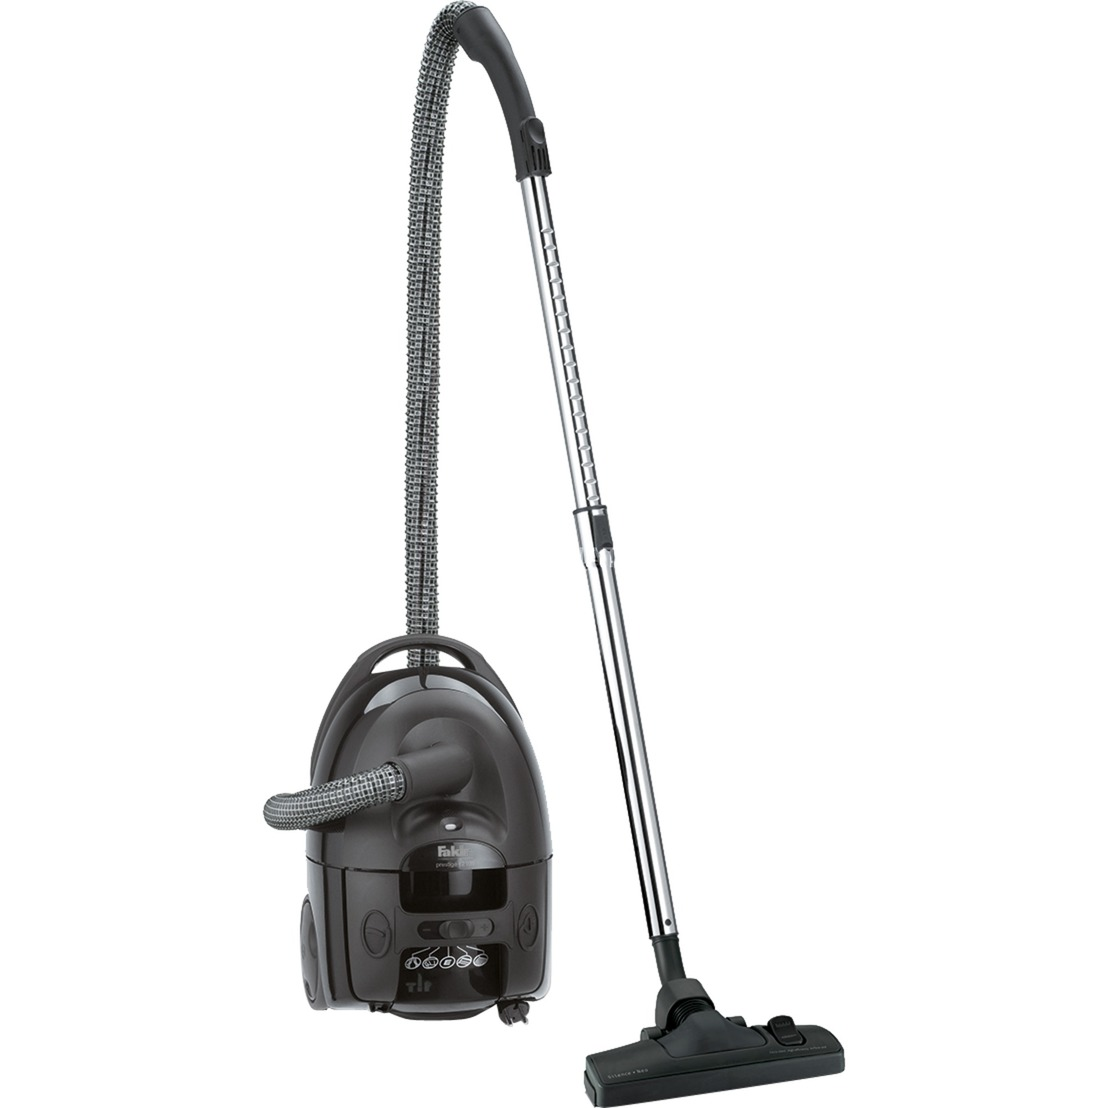 3616003 Aspiradora cilíndrica 4.5L 700W A Negro aspiradora, Aspiradora de suelo